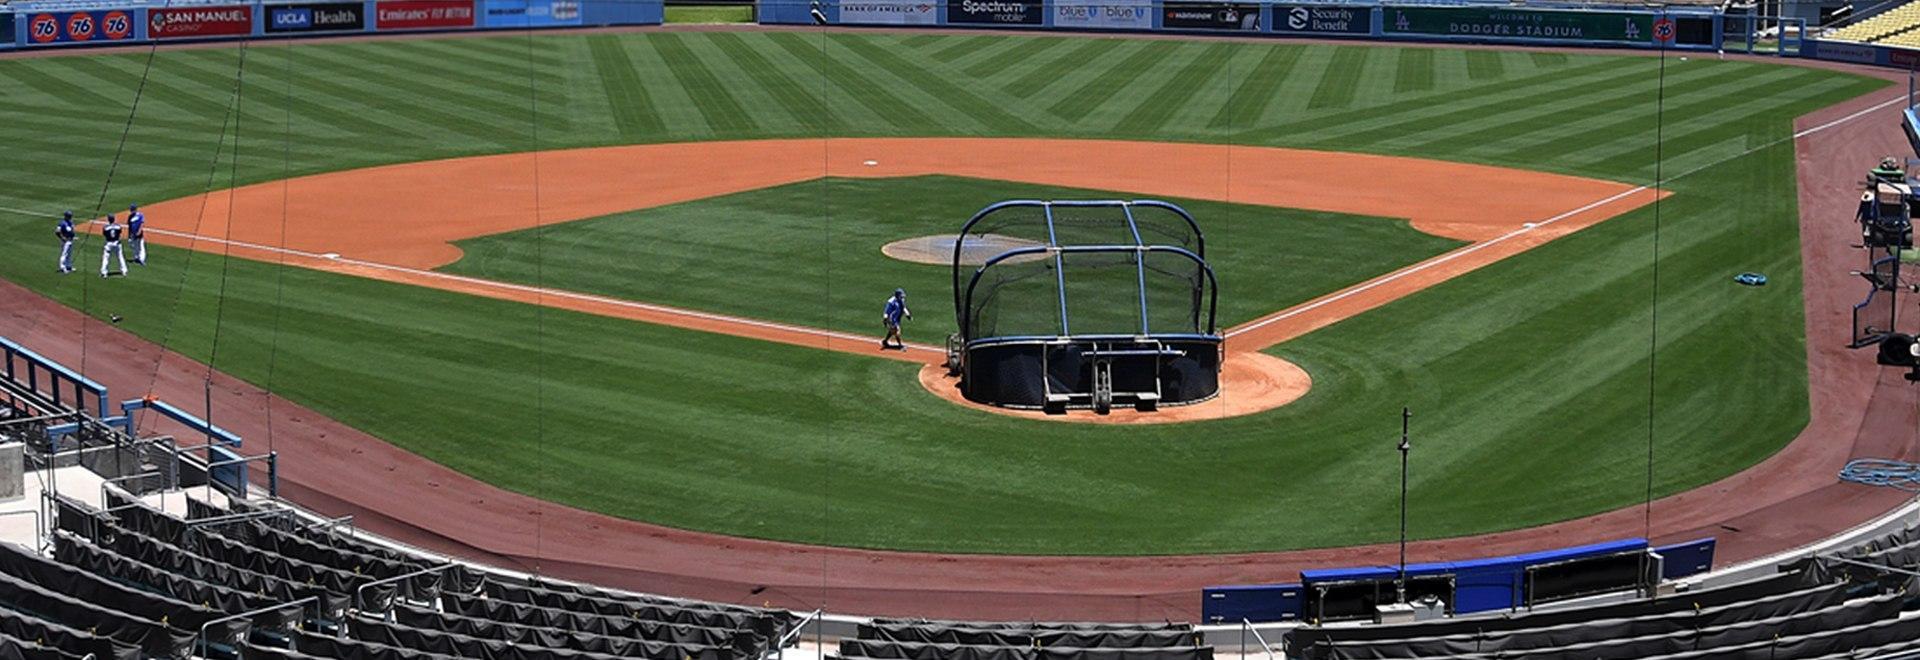 Tampa Bay - LA Dodgers. World Series. Game 5